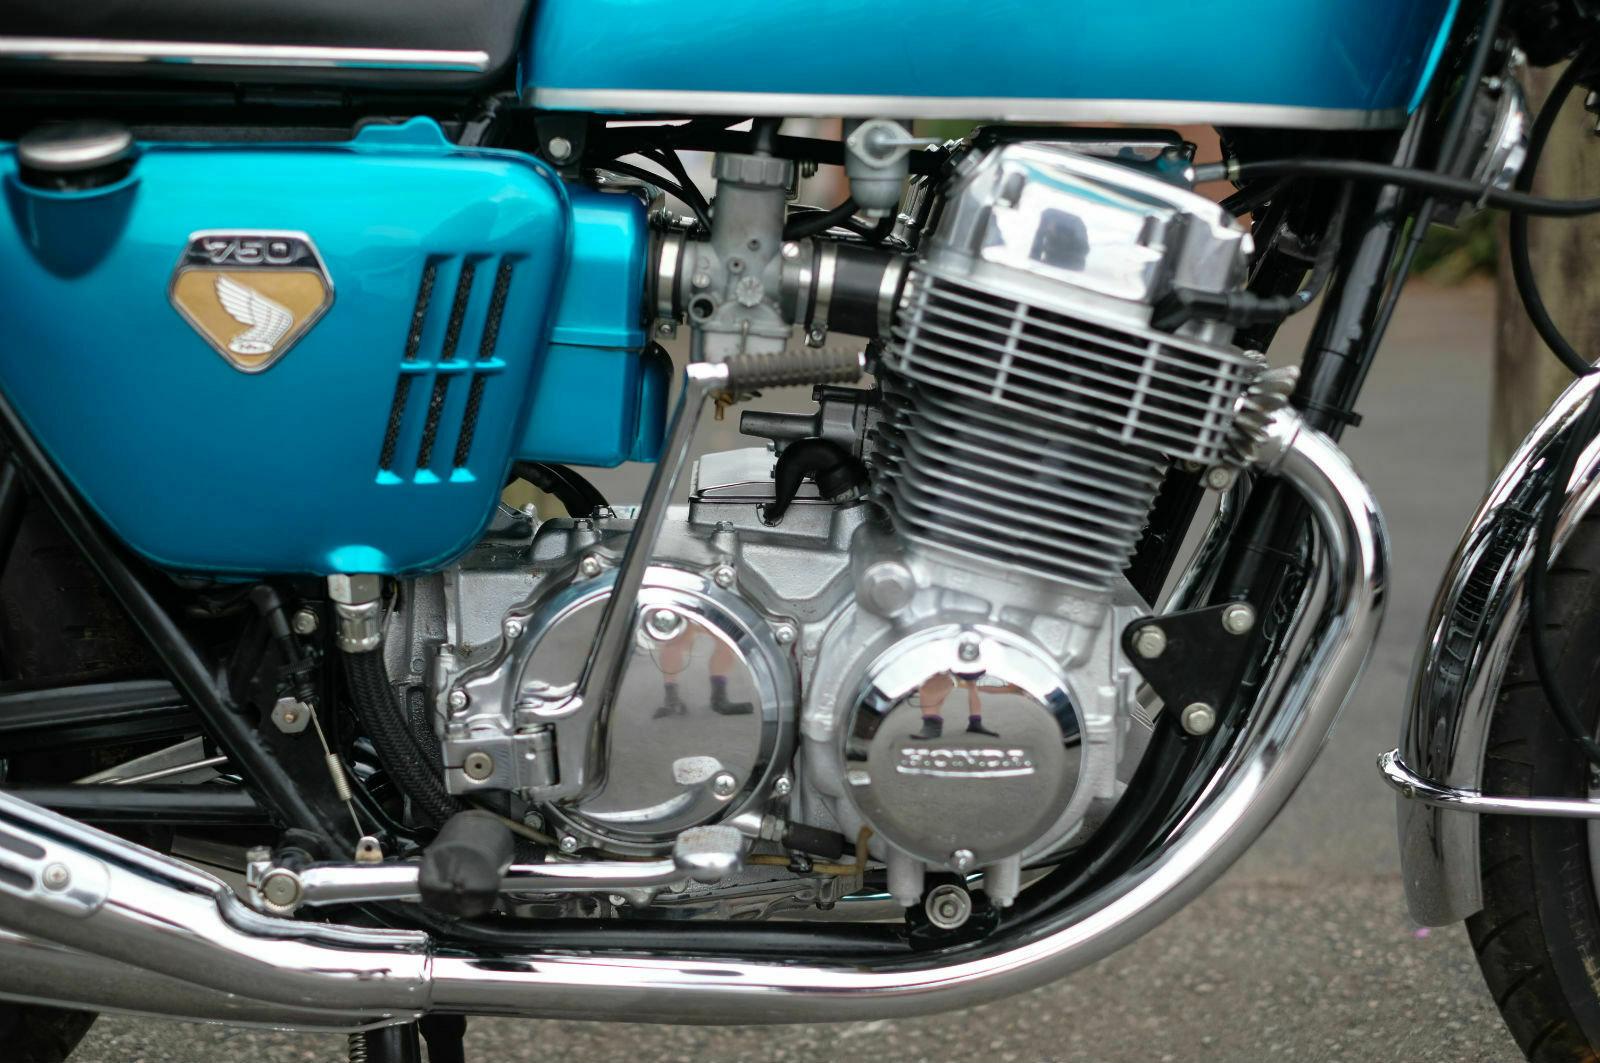 Honda CB750 CB 750 Sandcast 1969 ground up restoration *STUN SOLD (picture 4 of 6)